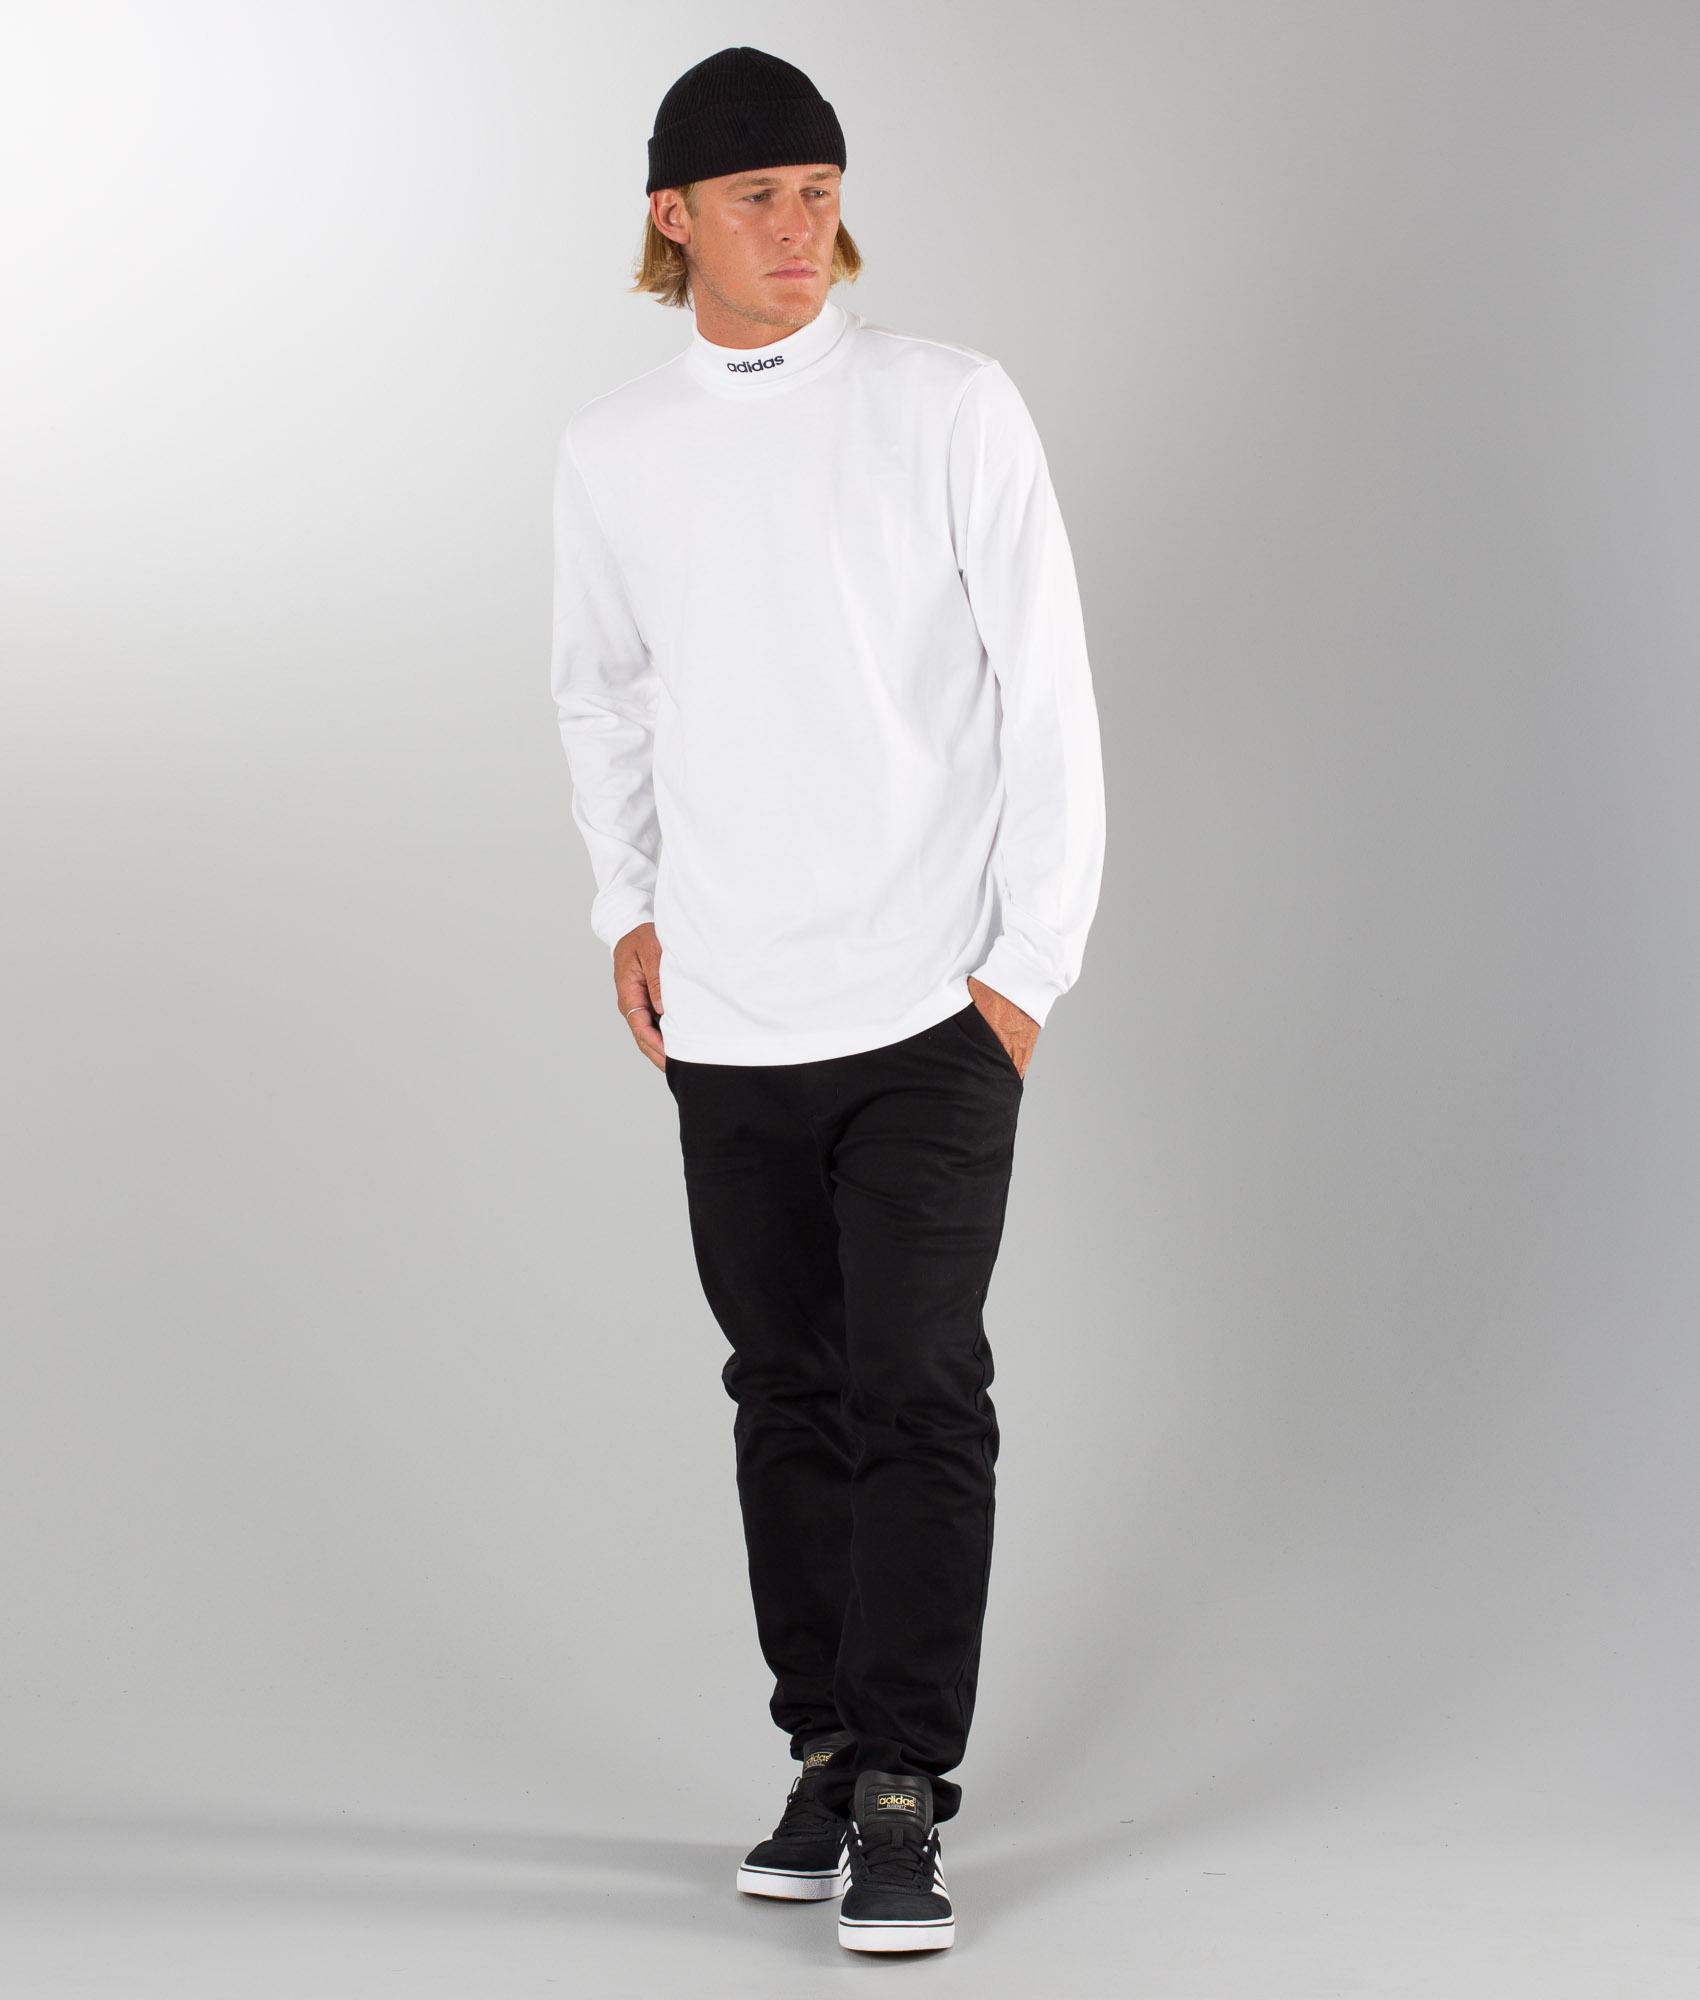 Whitecollgegiate De Pull Adidas Hicollar Navy Chez Skateboarding xqFXwOnz8v